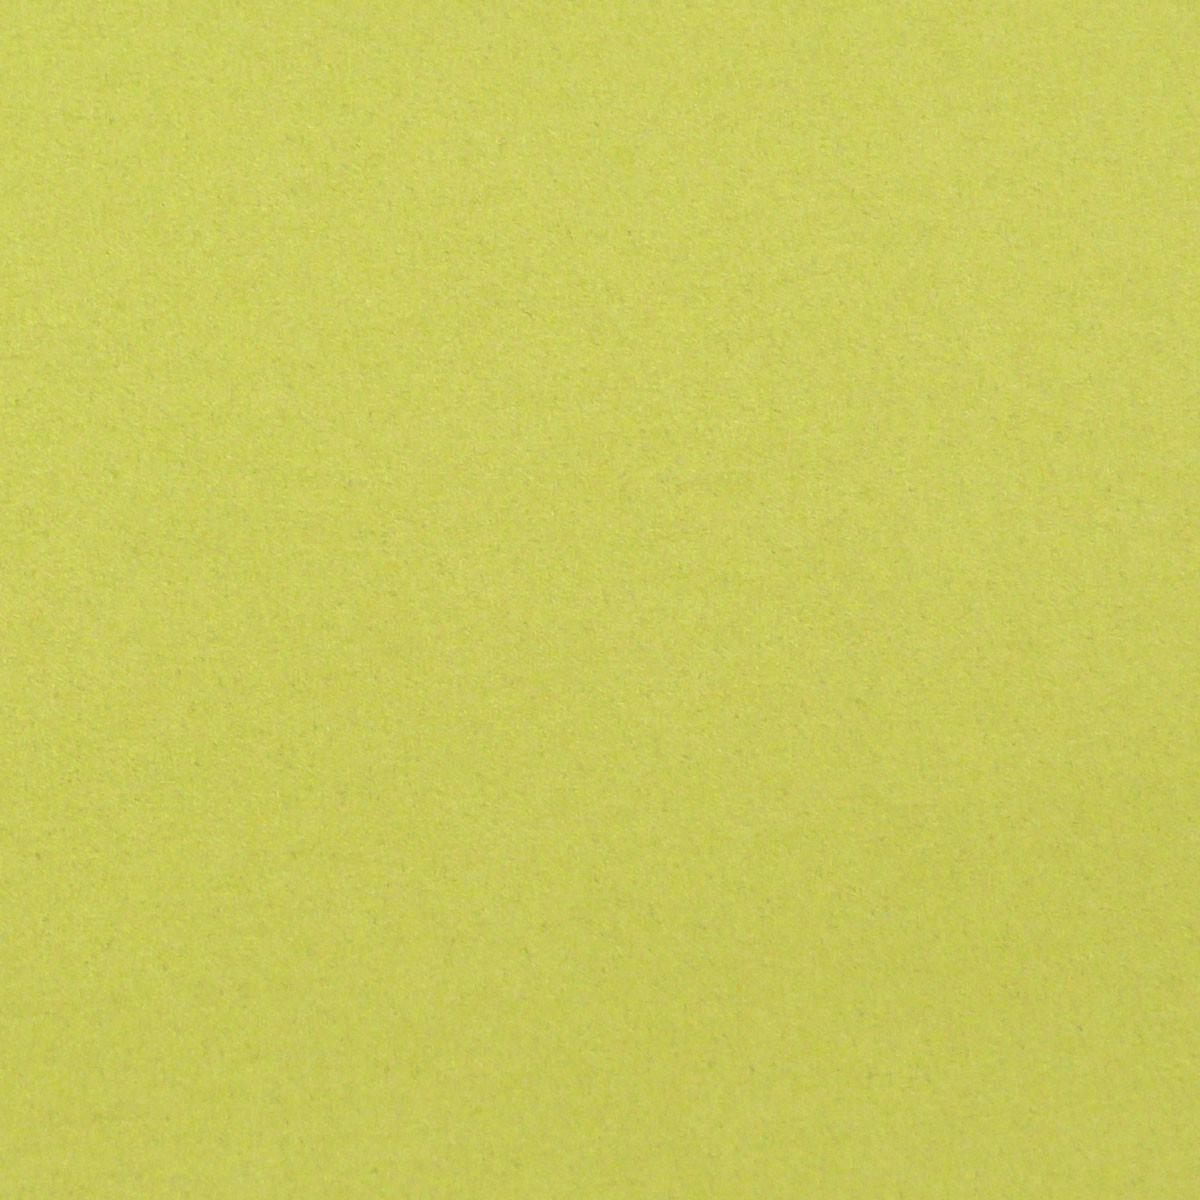 Bezugsstoff Möbelstoff Polsterstoff Microfaser Meterware apfelgrün